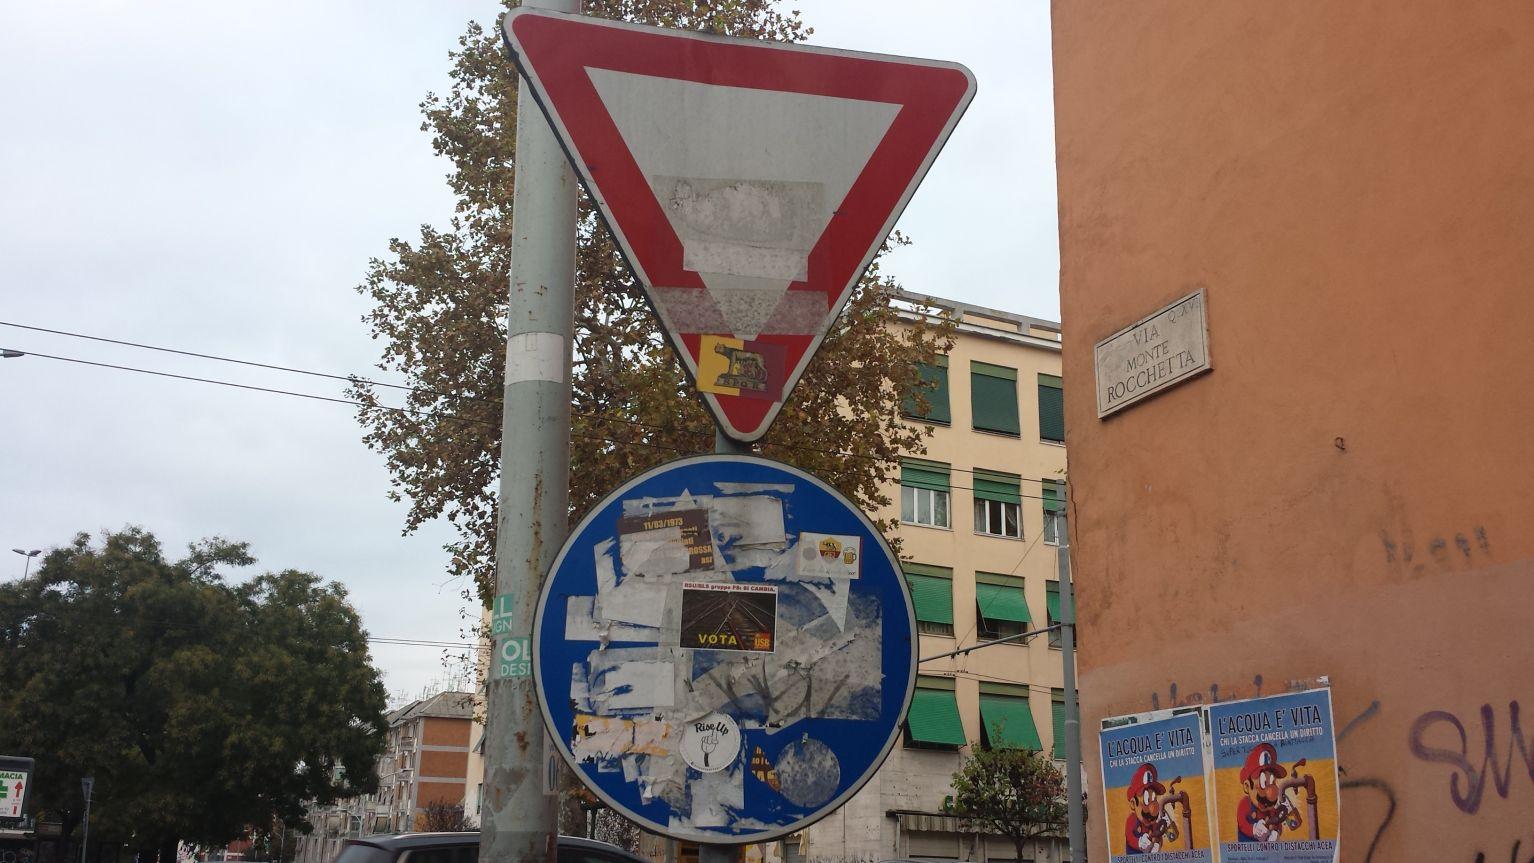 cartello stradale degrado